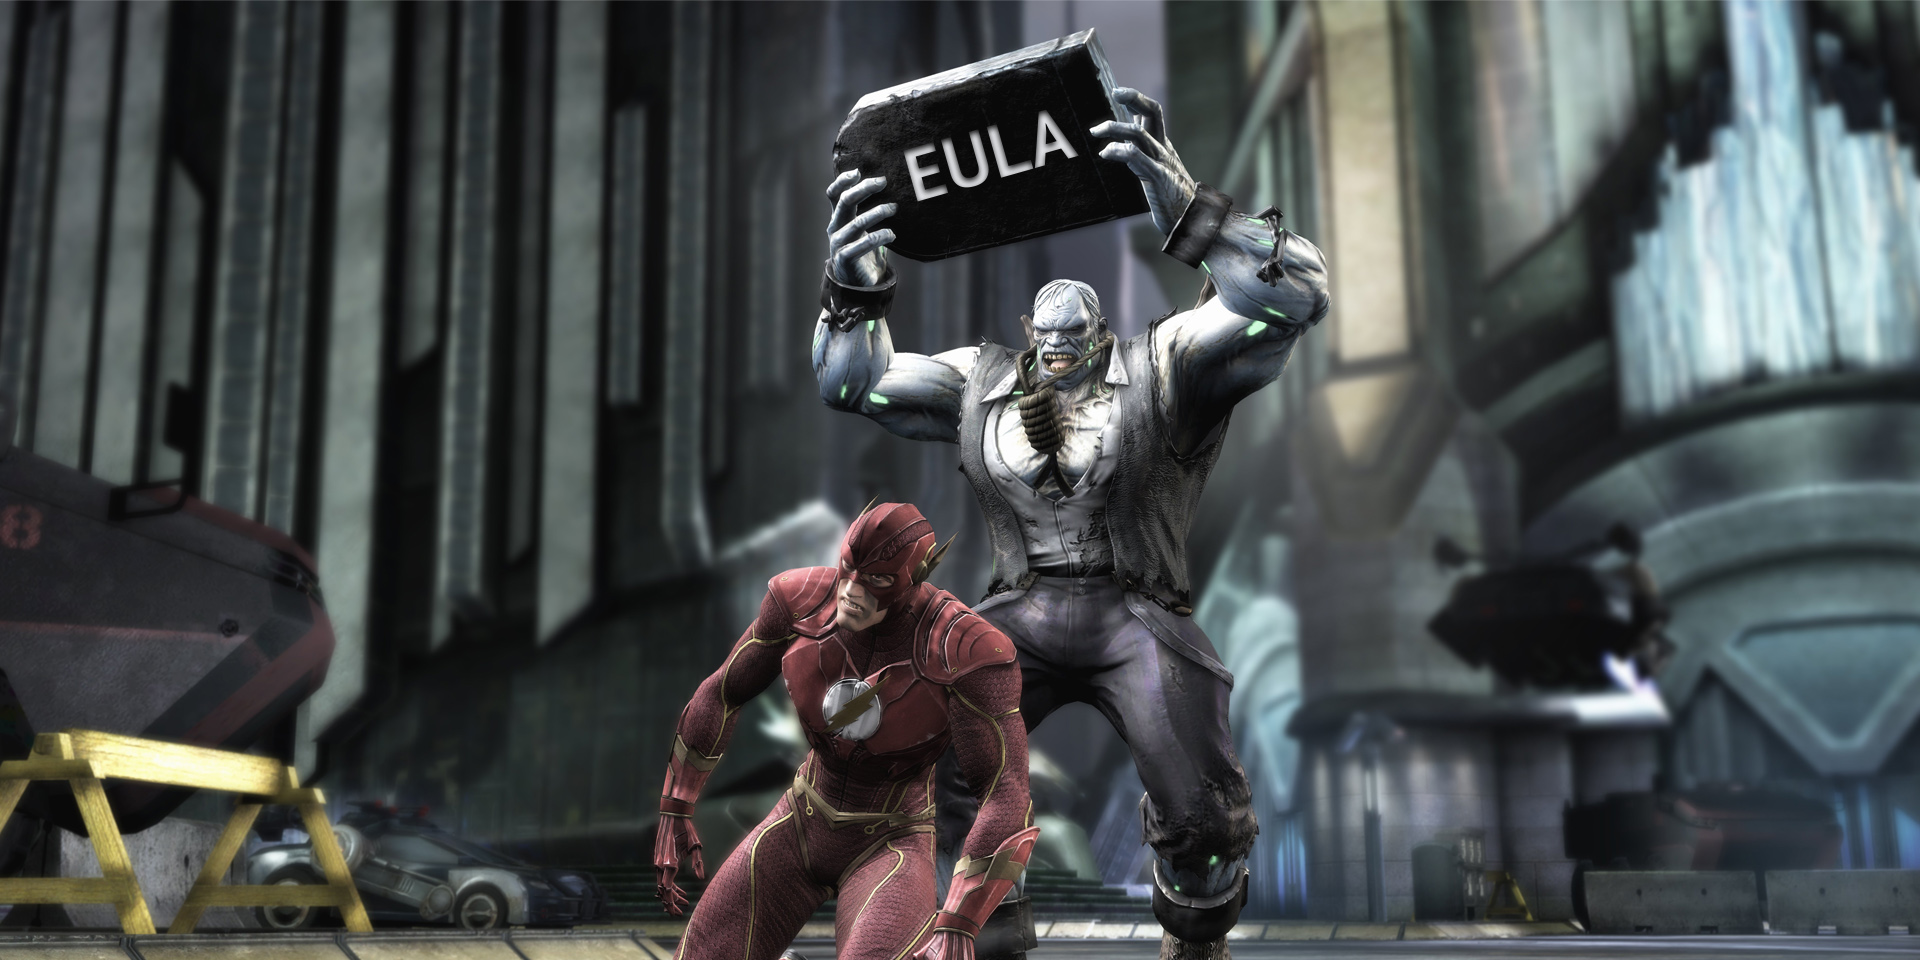 MMO-индустрия: Unity жестко критикуют за запрет SpatialOS, авторы игрового движка отреагировали